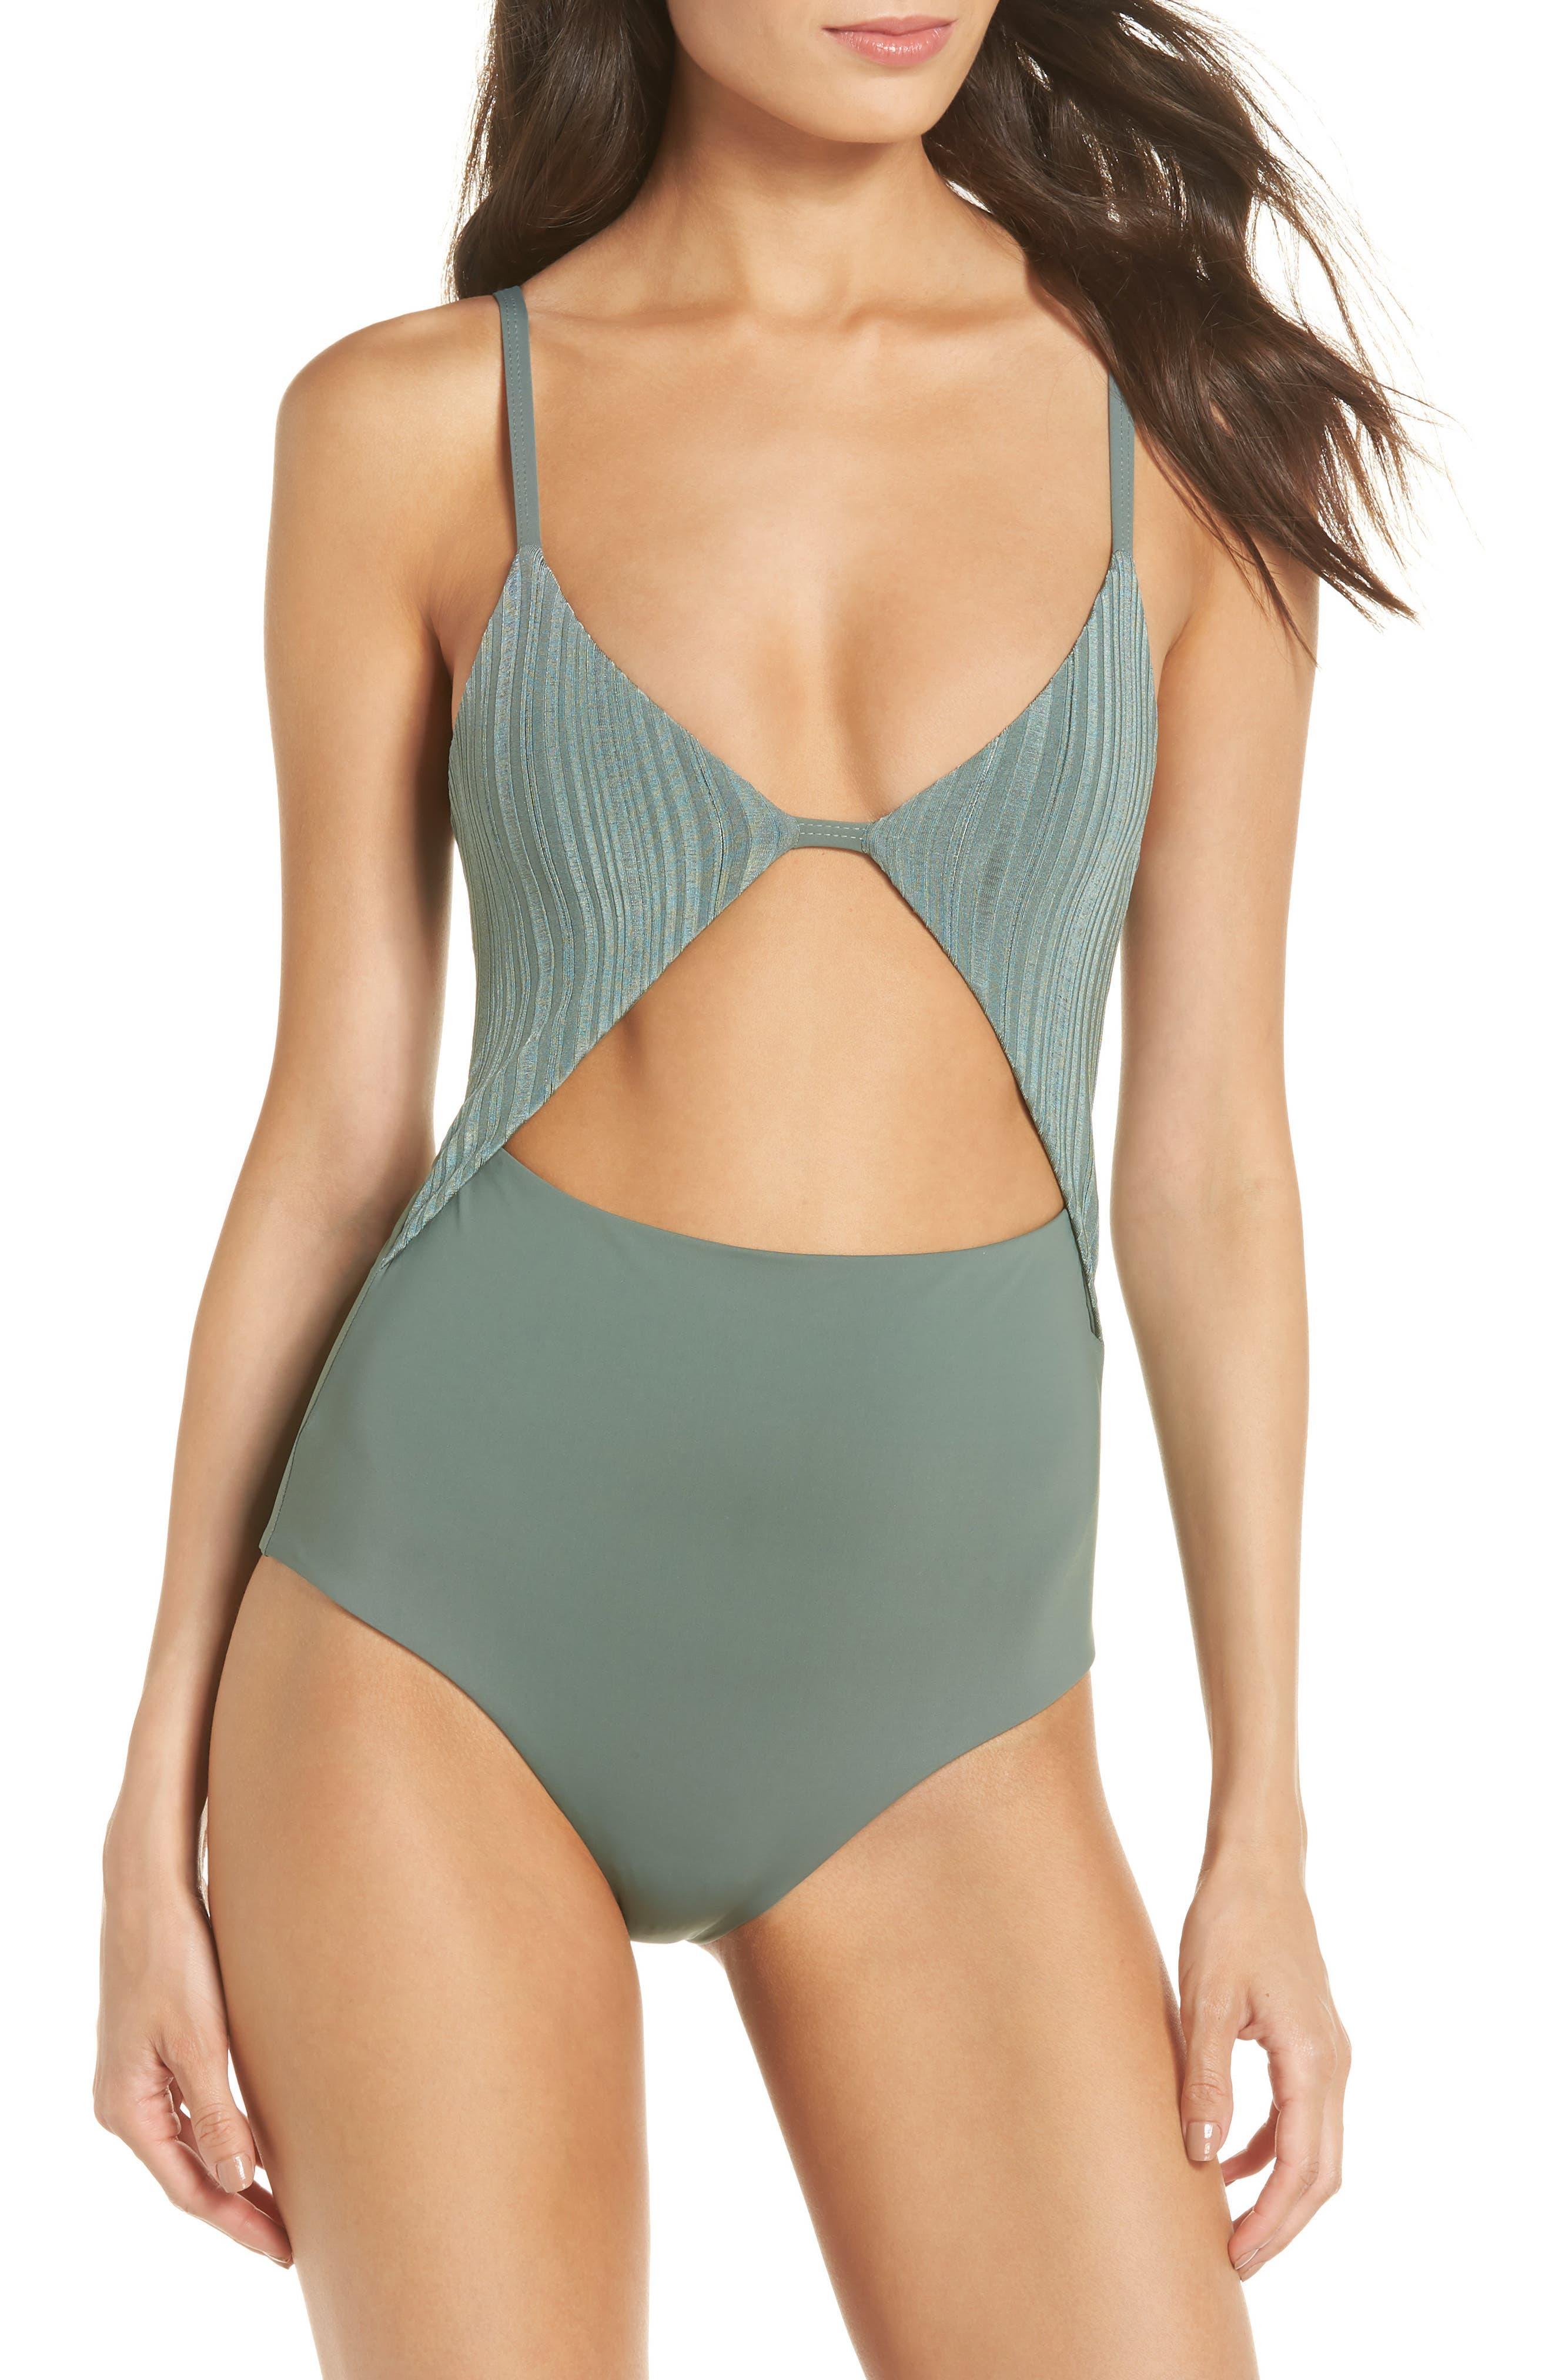 Penelope Cutout One-Piece Swimsuit,                         Main,                         color, MEADOW GREEN